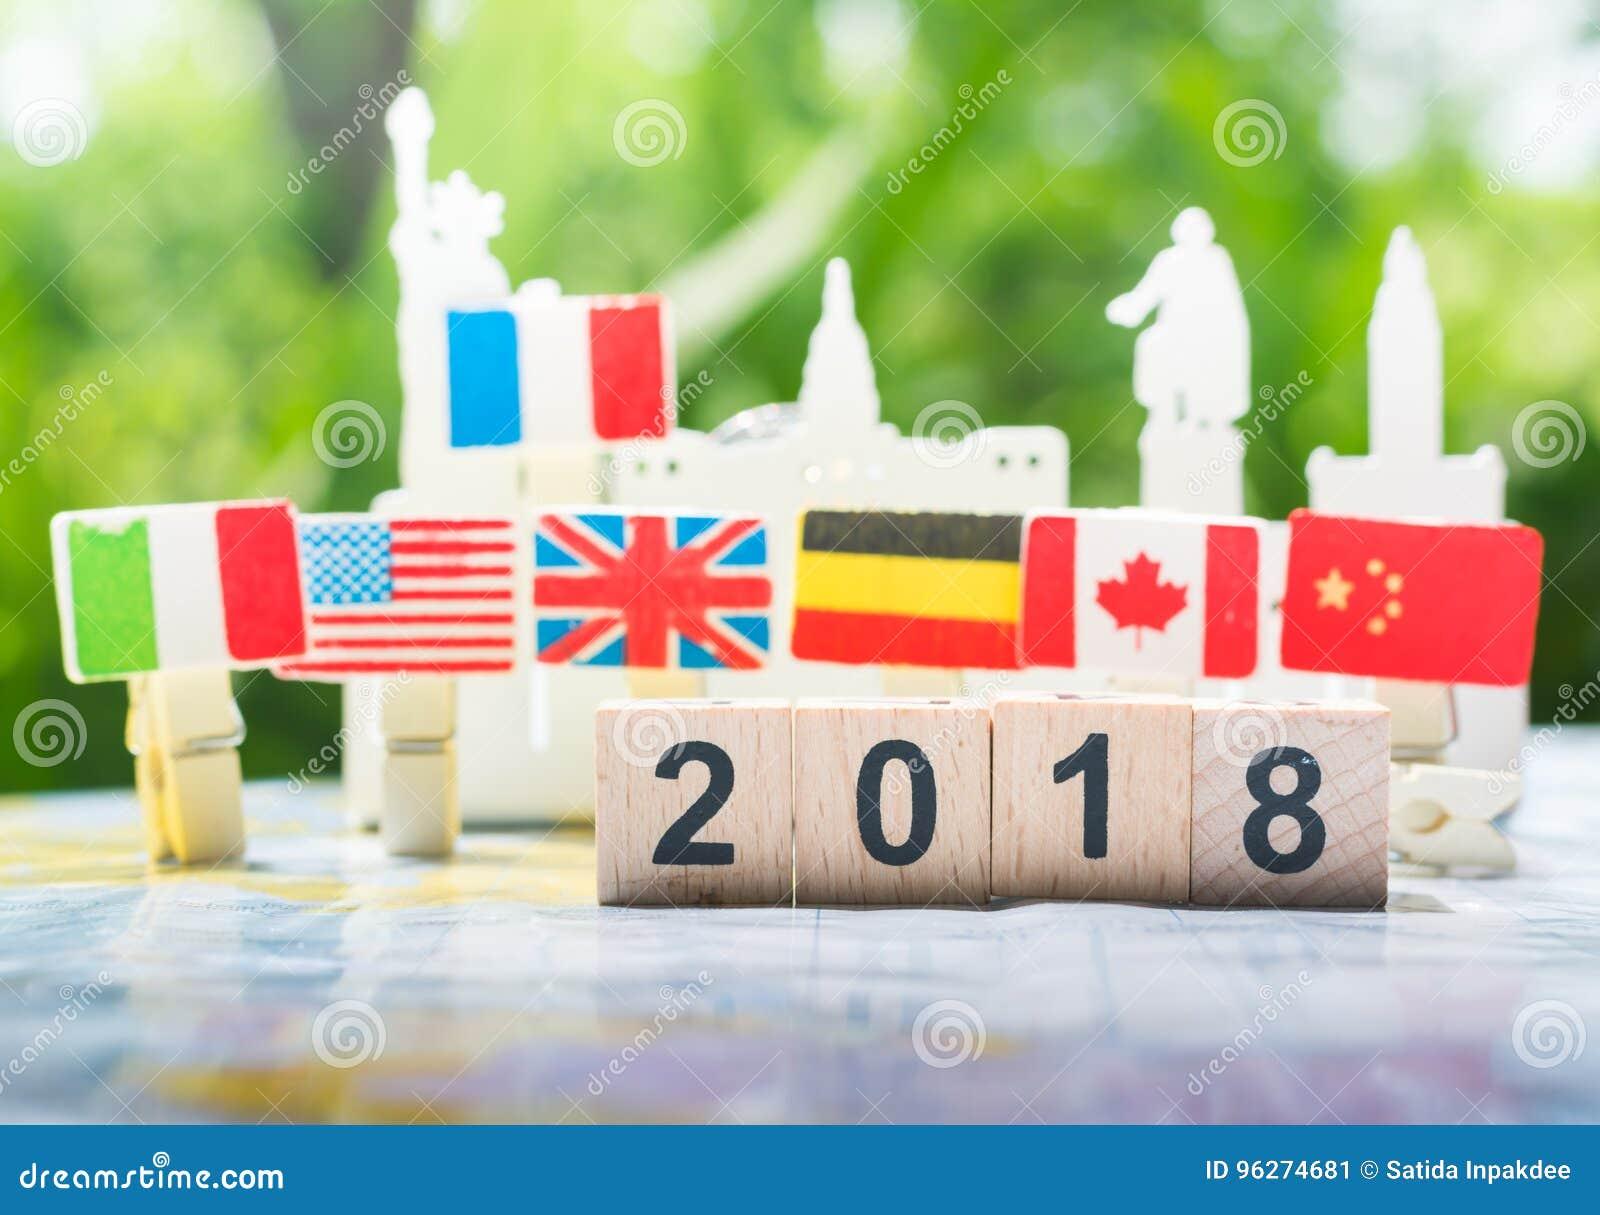 Happy new year 2018 concept, international cooperation,teamwork